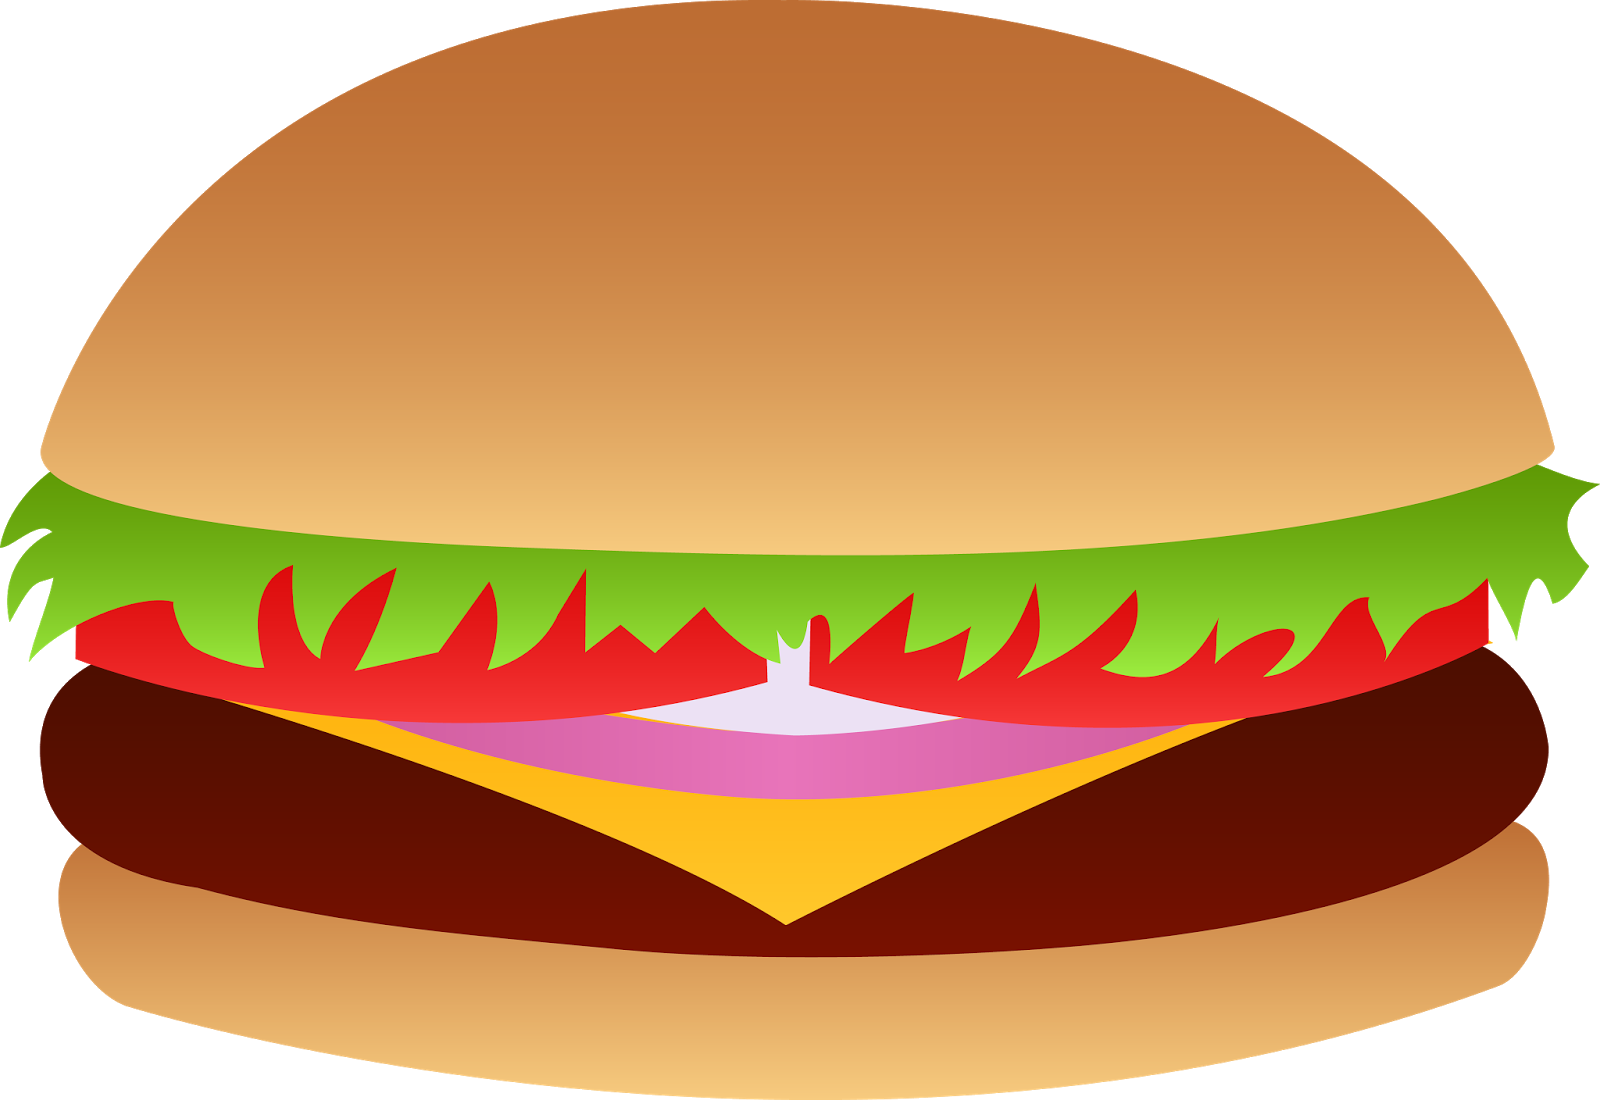 Buffalo grill narbonne . Clipart restaurant restaurant review